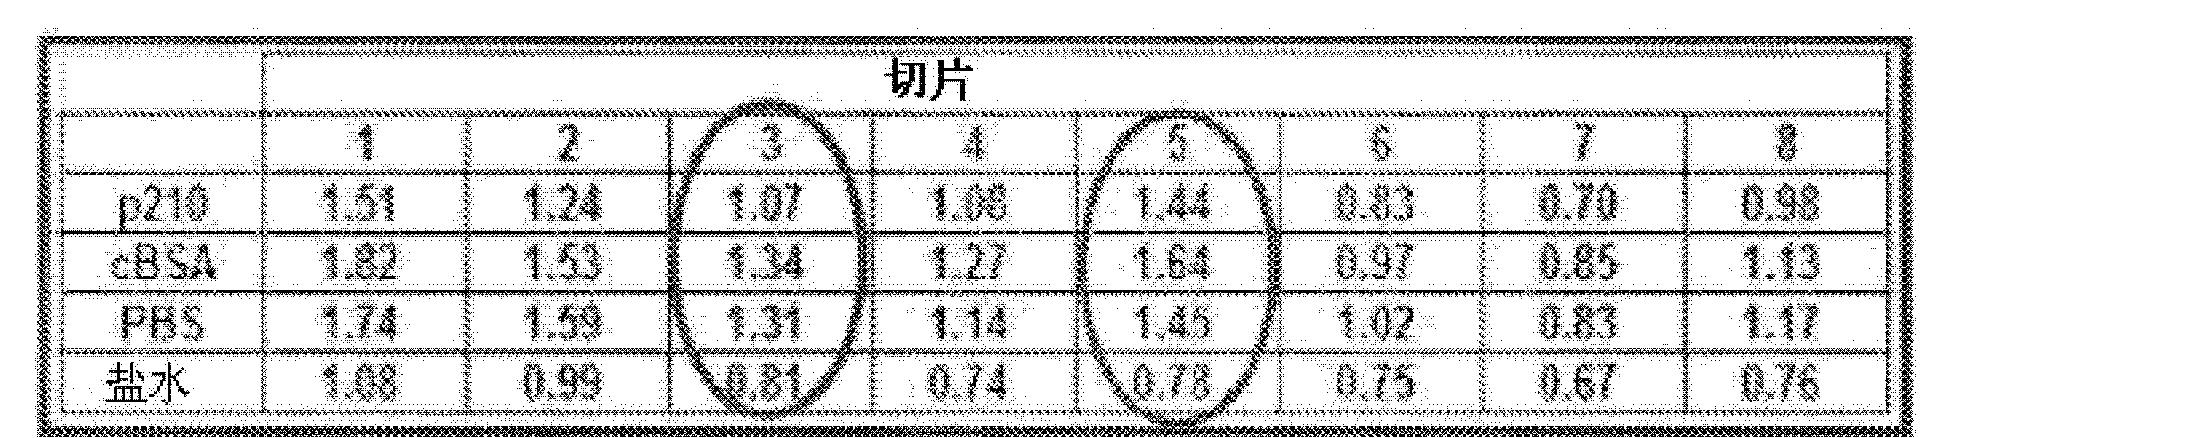 Figure CN103501806AD00341